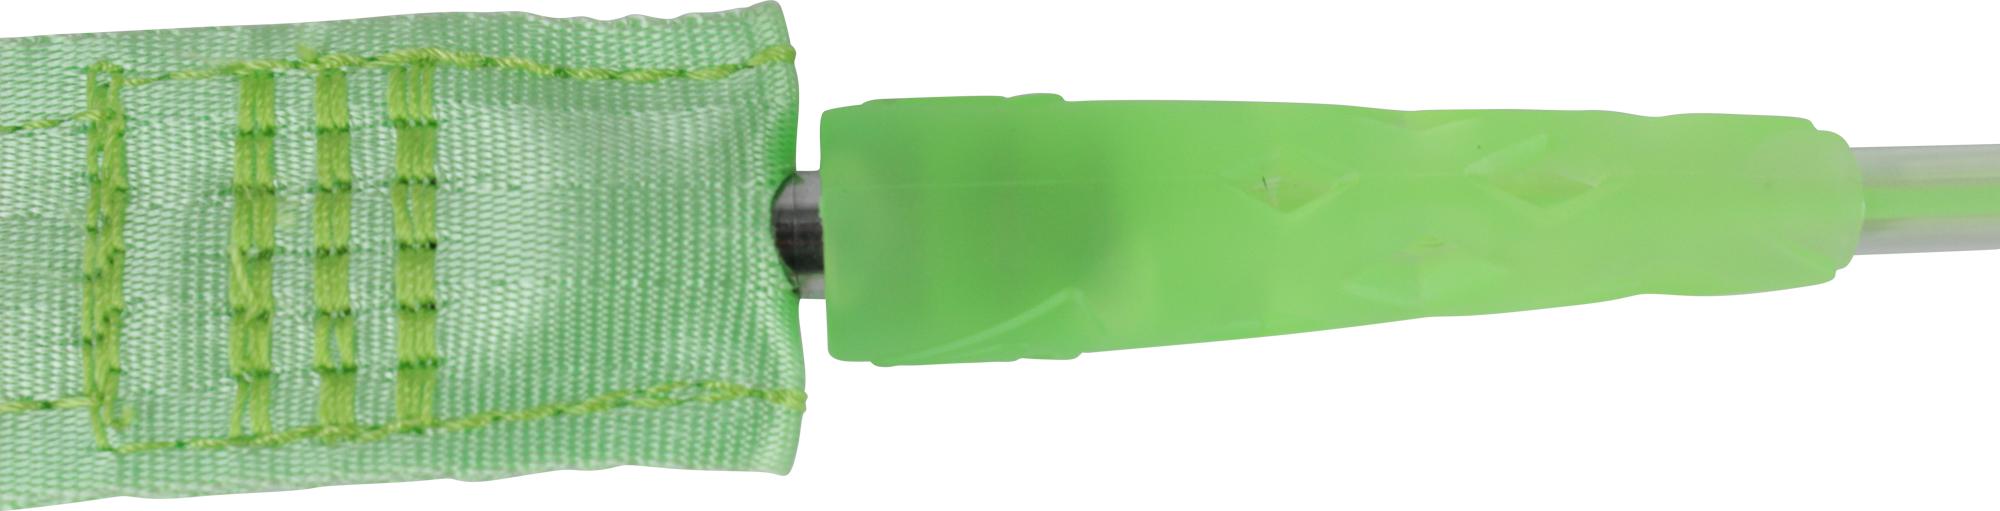 8 Celtic Green Quiksilver Highline Surfboard Leash